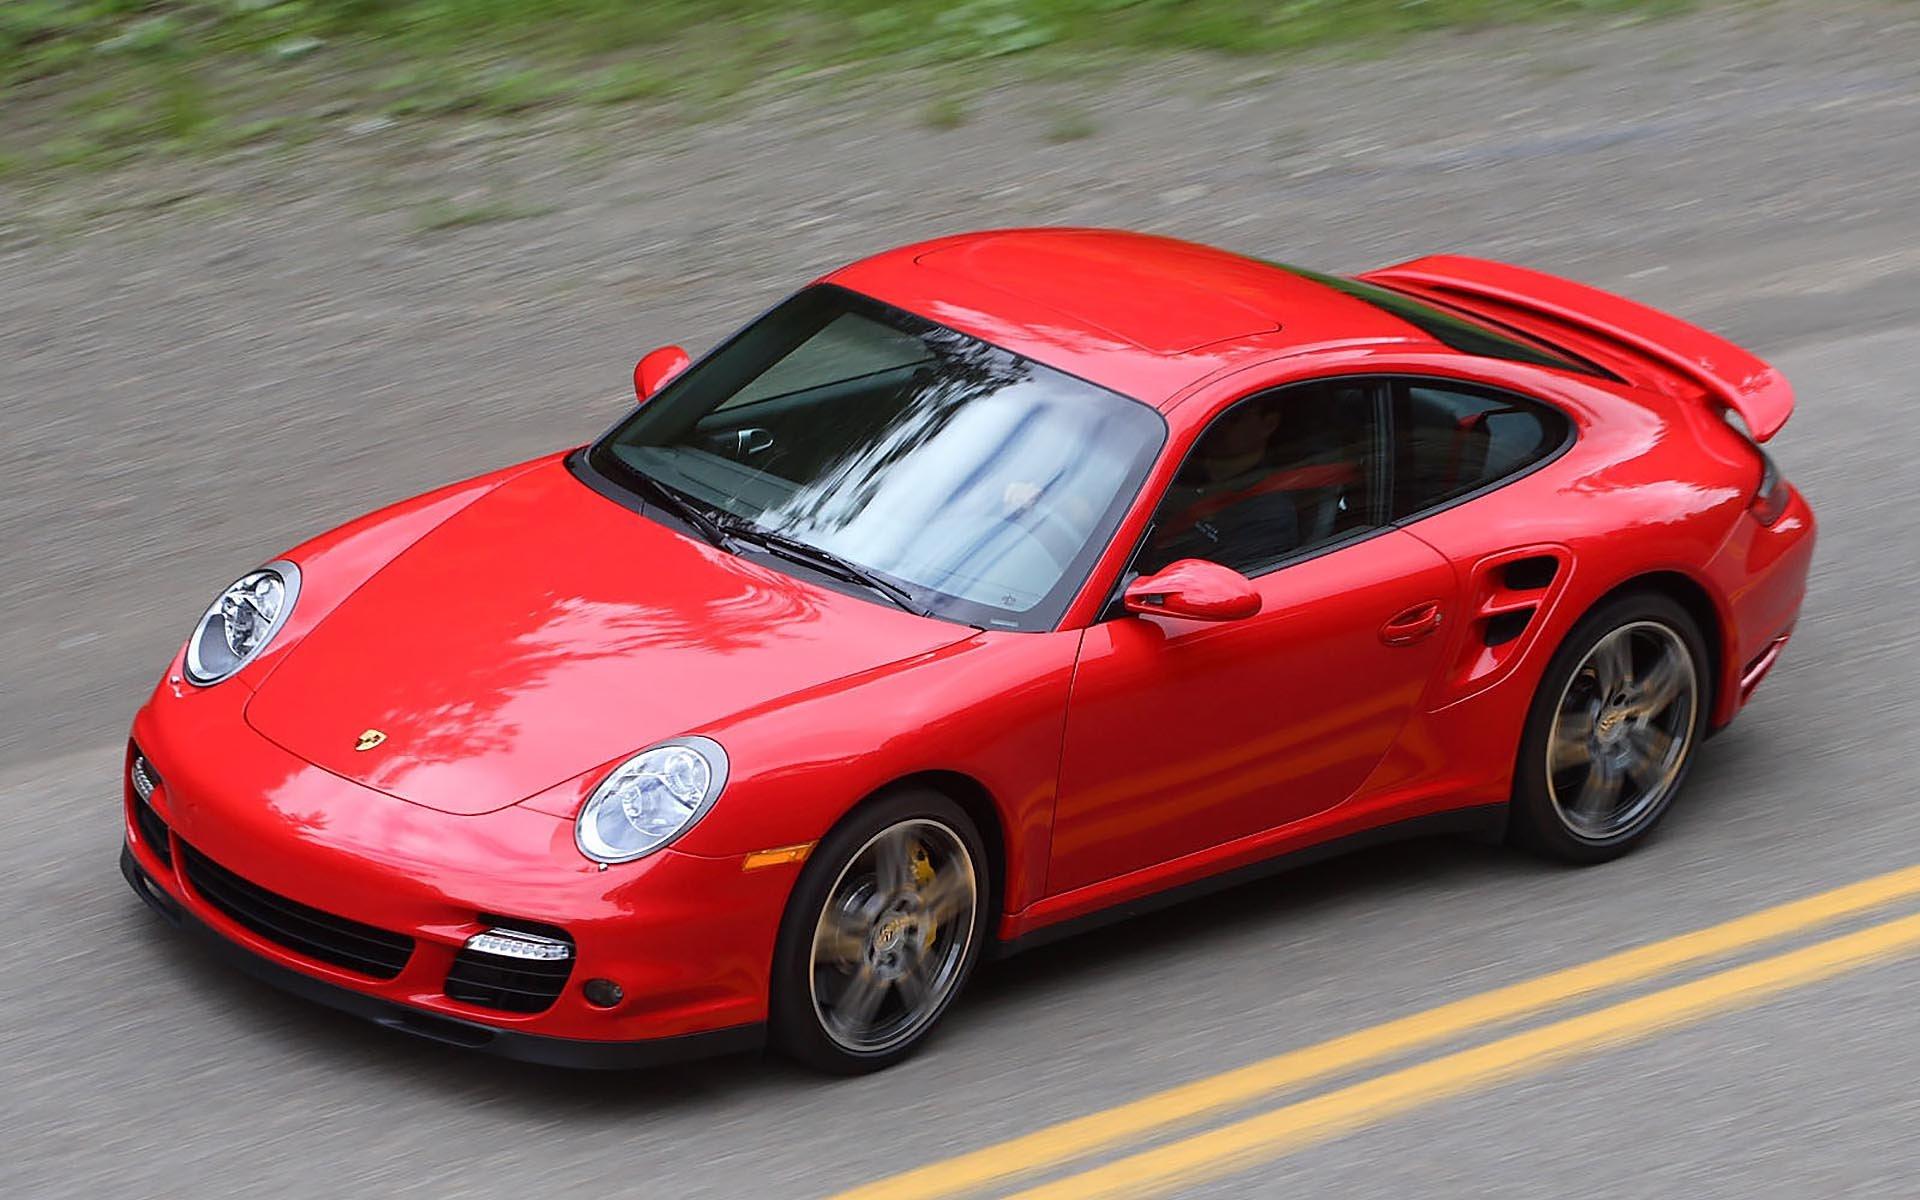 13_Porsche 997 911 Turbo front